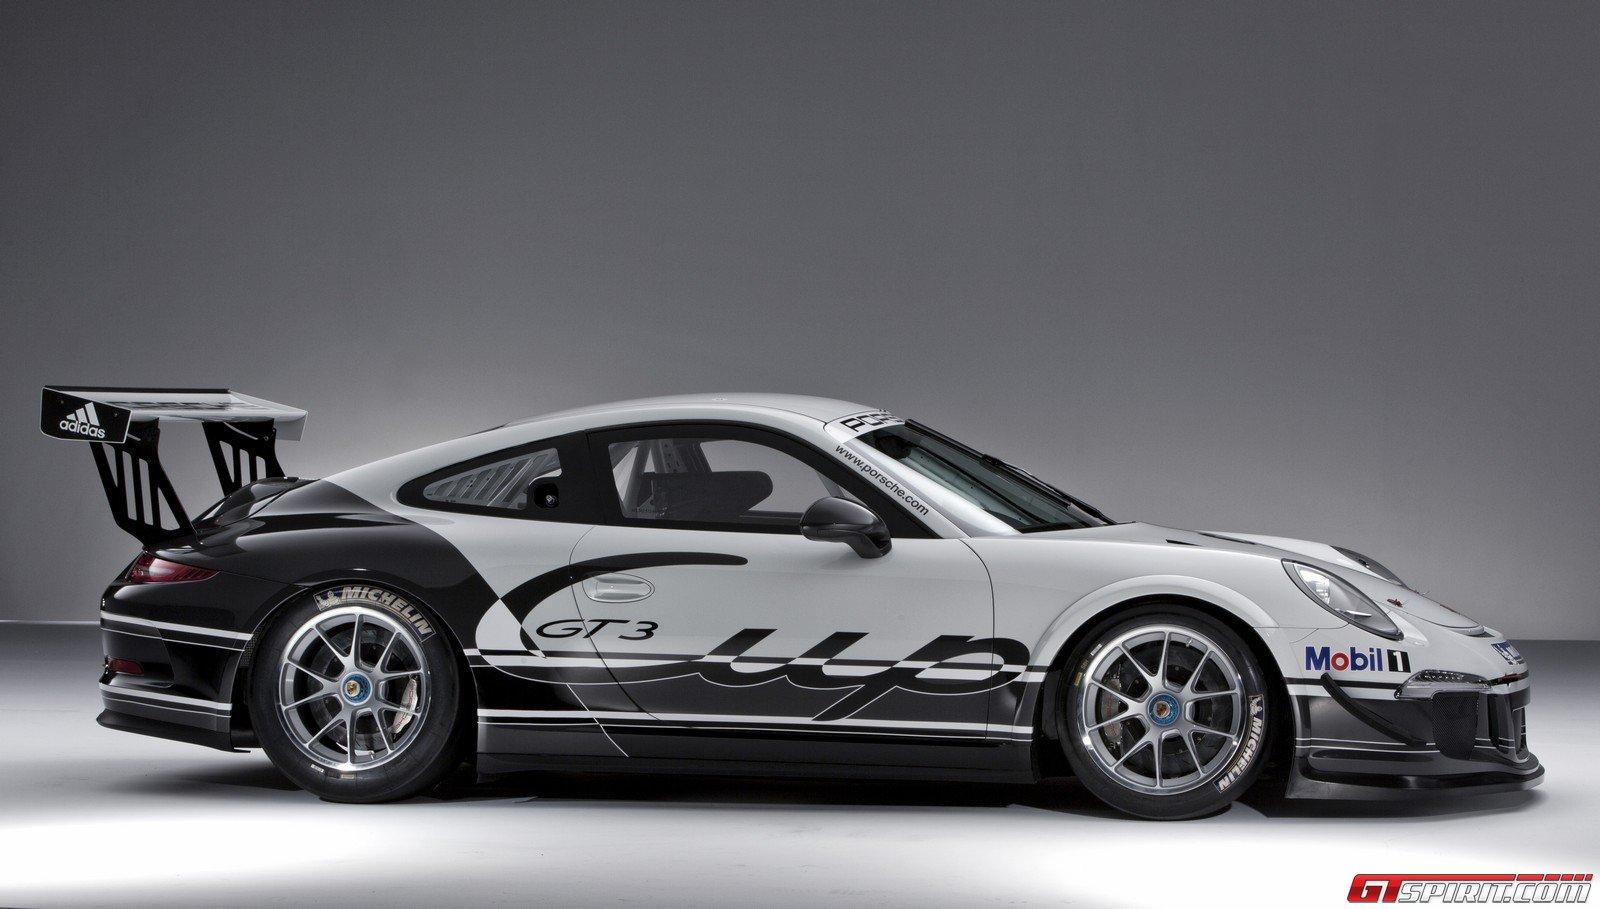 2013 Porsche 911 GT3 Cup Photo 5